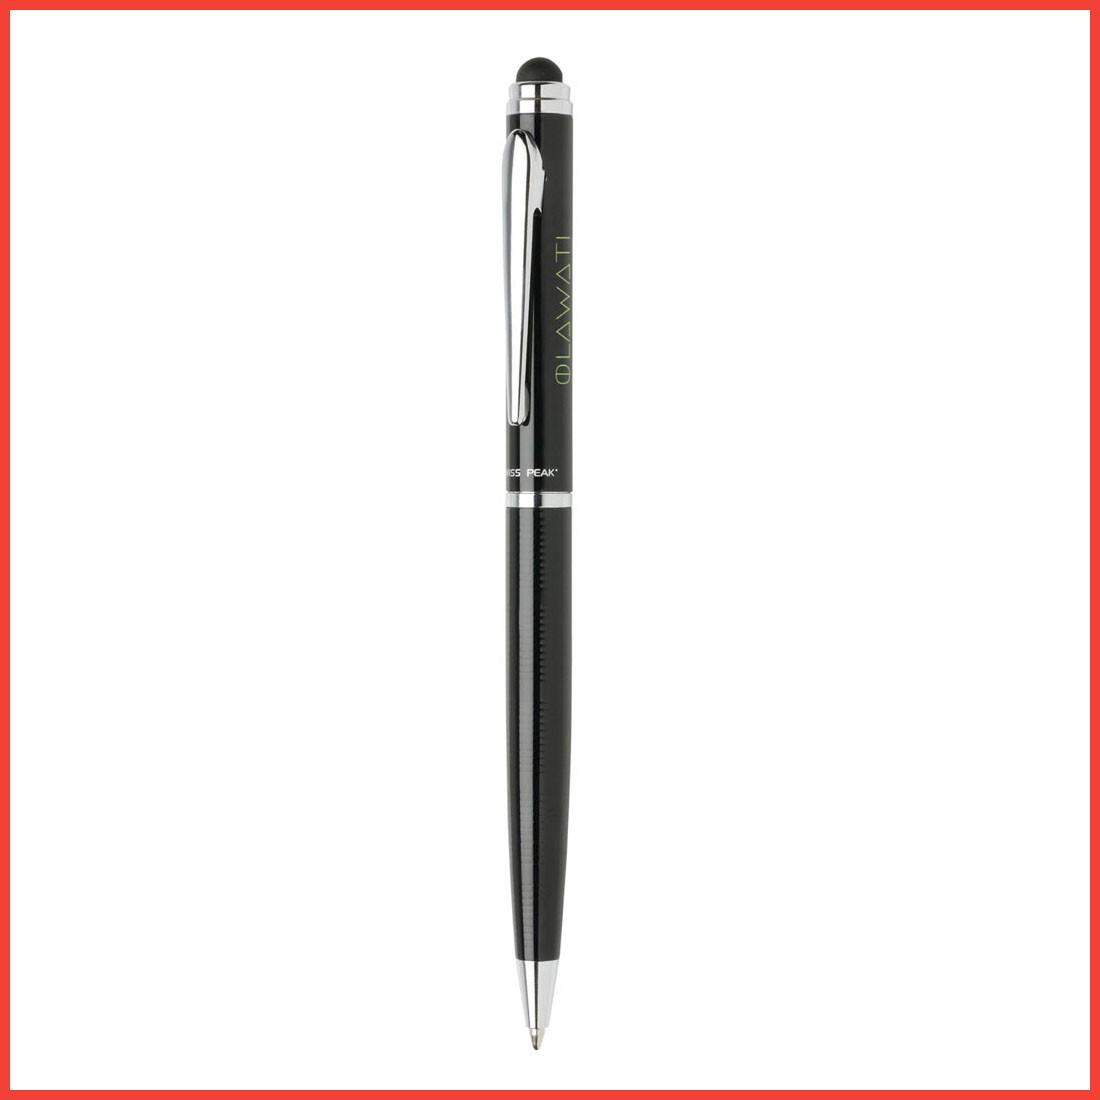 SP SENNA- Swiss Peak Deluxe Stylus Pen (Screen print)